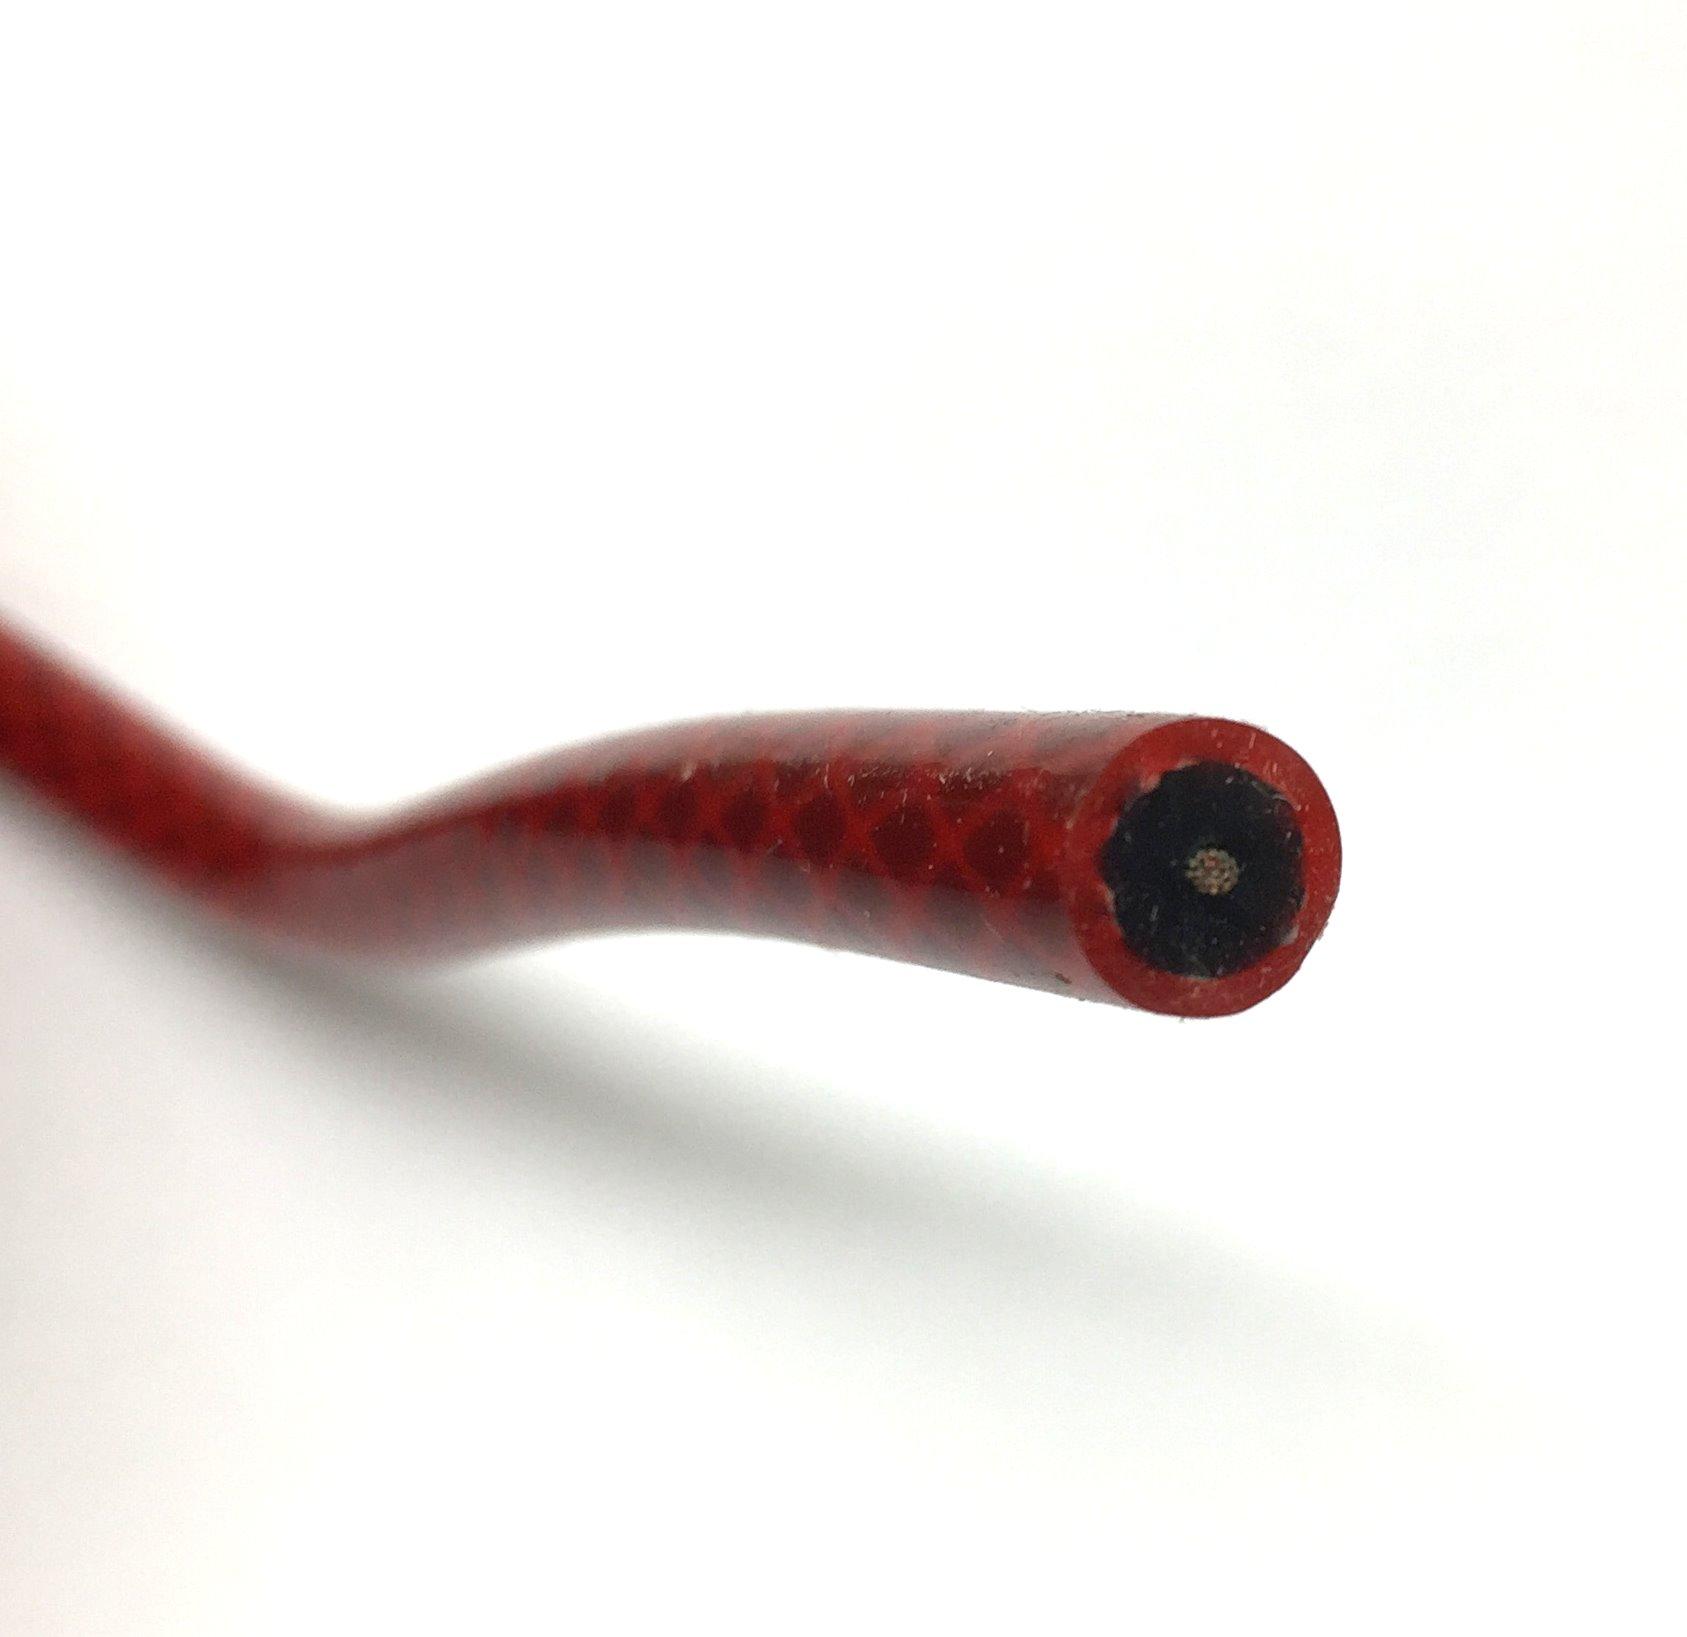 Zündkabel Silkon, rot, 1,0mm², außen-d= 7mm, 1m